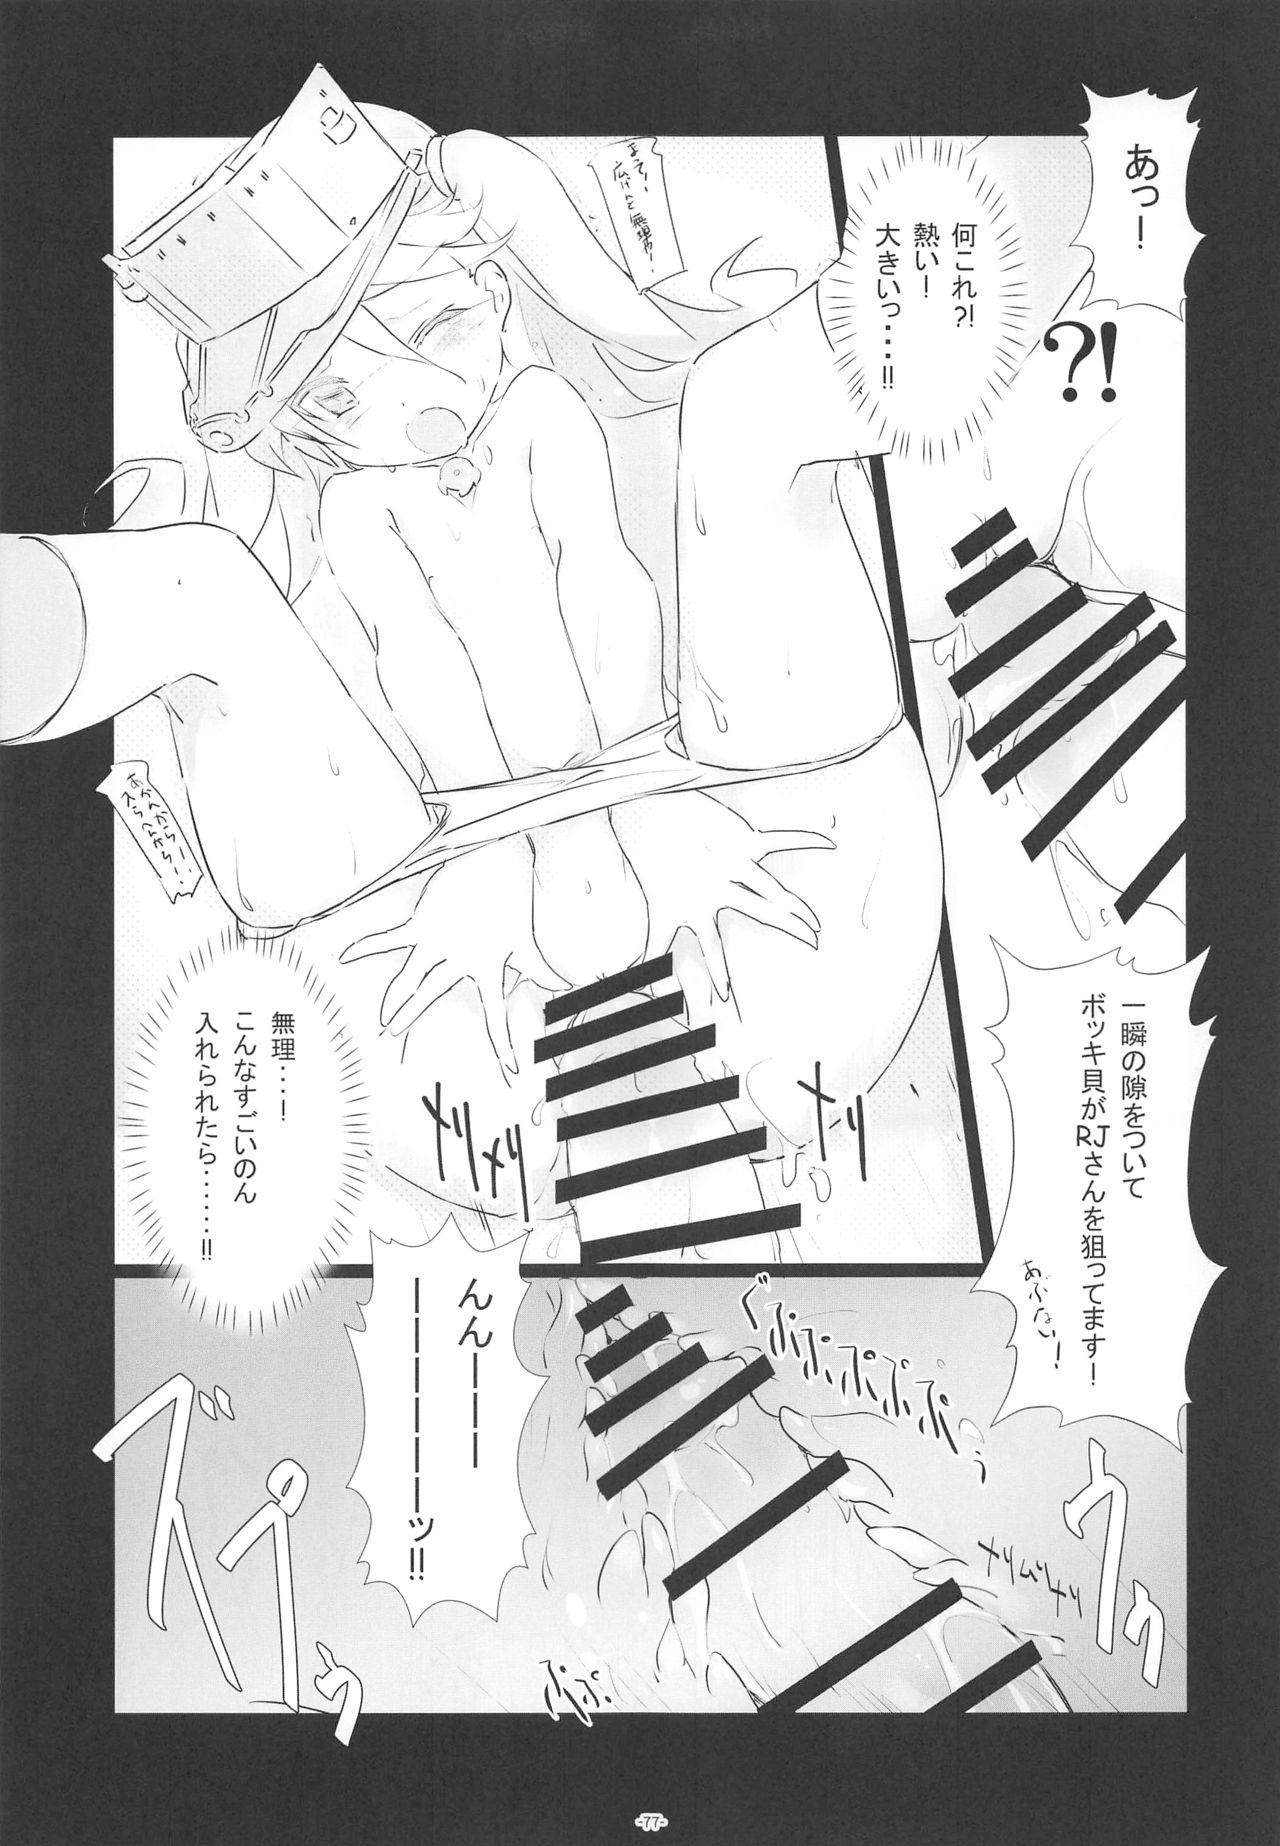 Korokoro-Manman II Korokoro:P Soushuuhen II 75